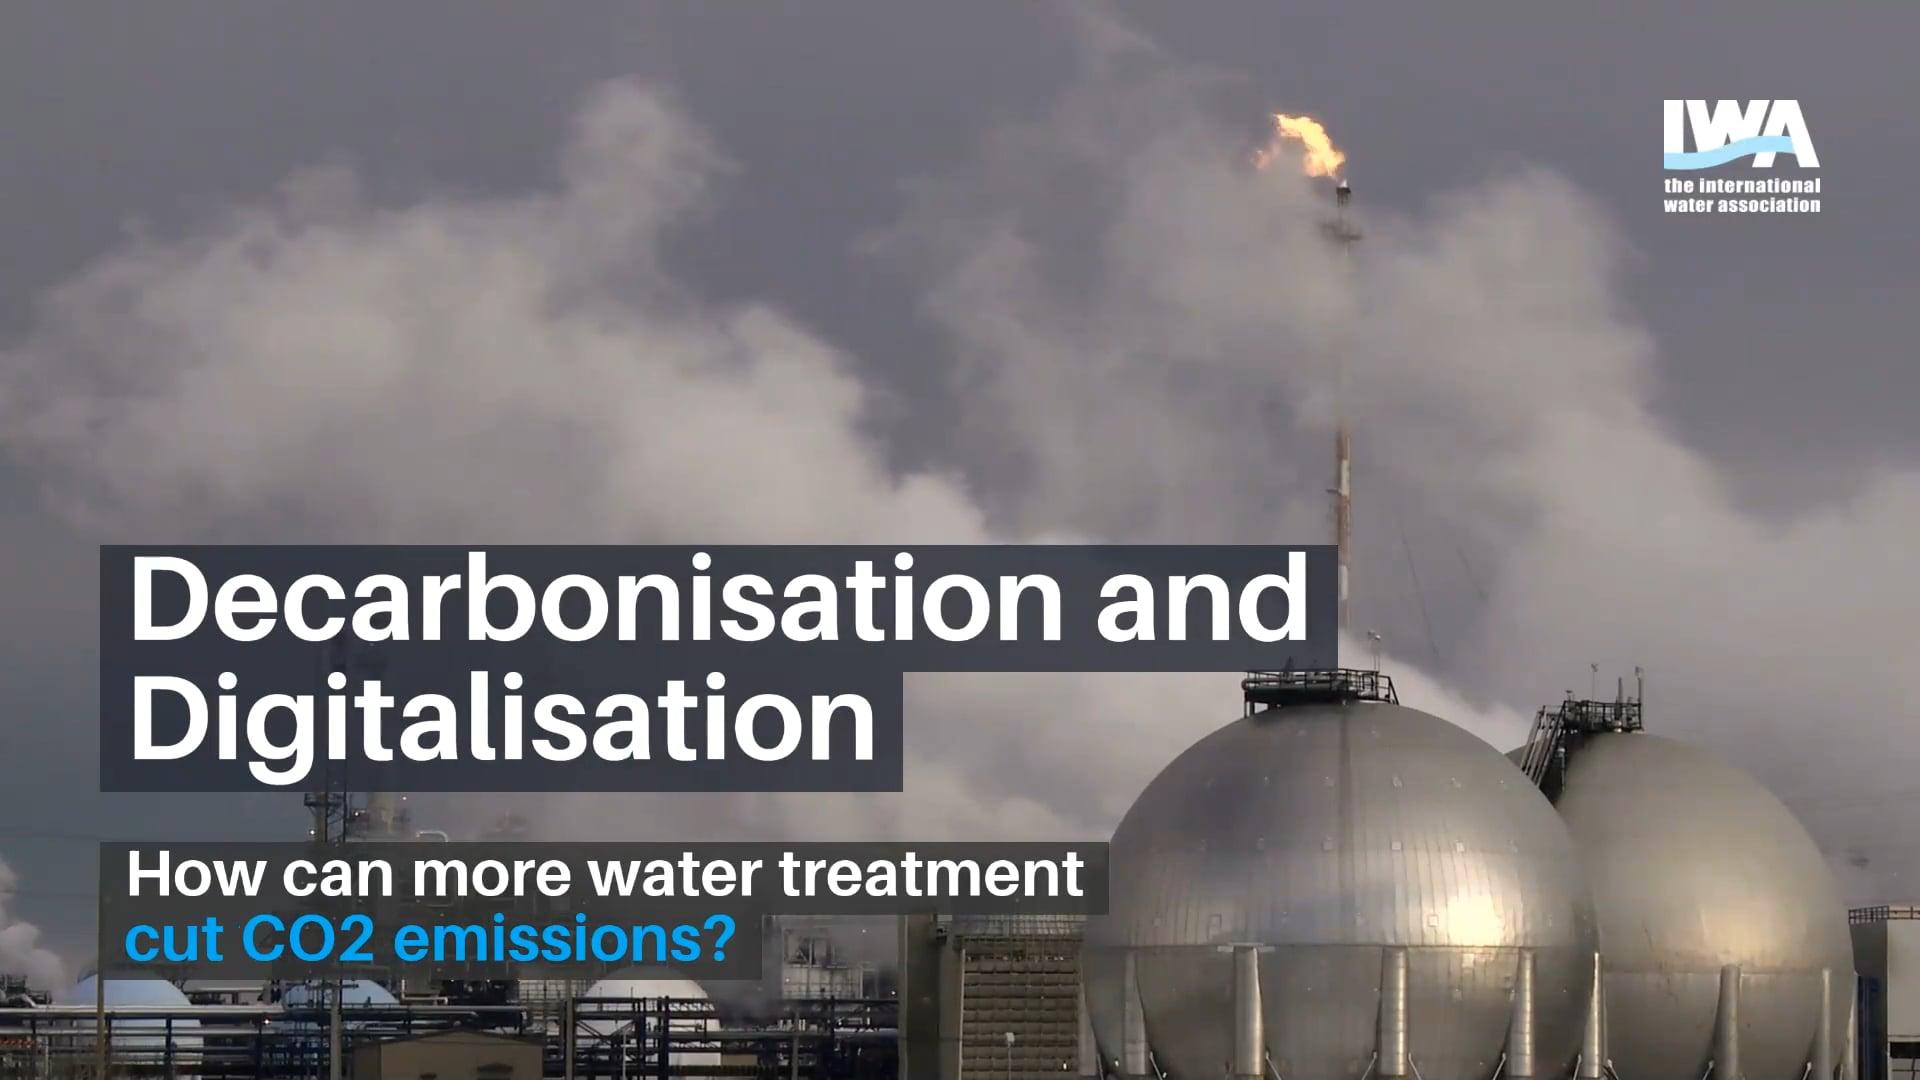 Decarbonisation and Digitalisation